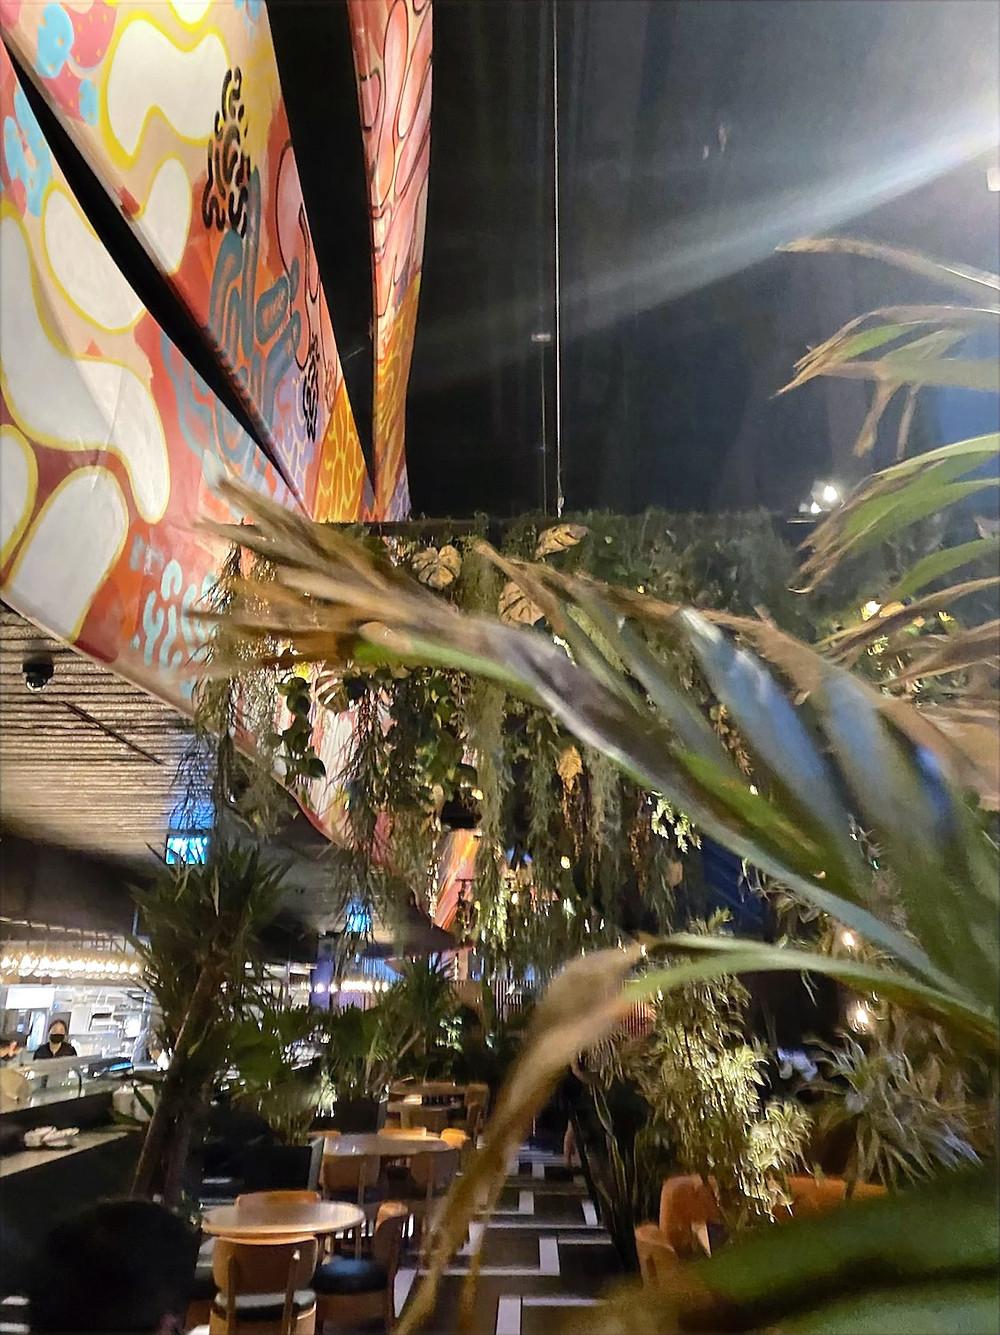 Restaurant Chotto Matte Toronto